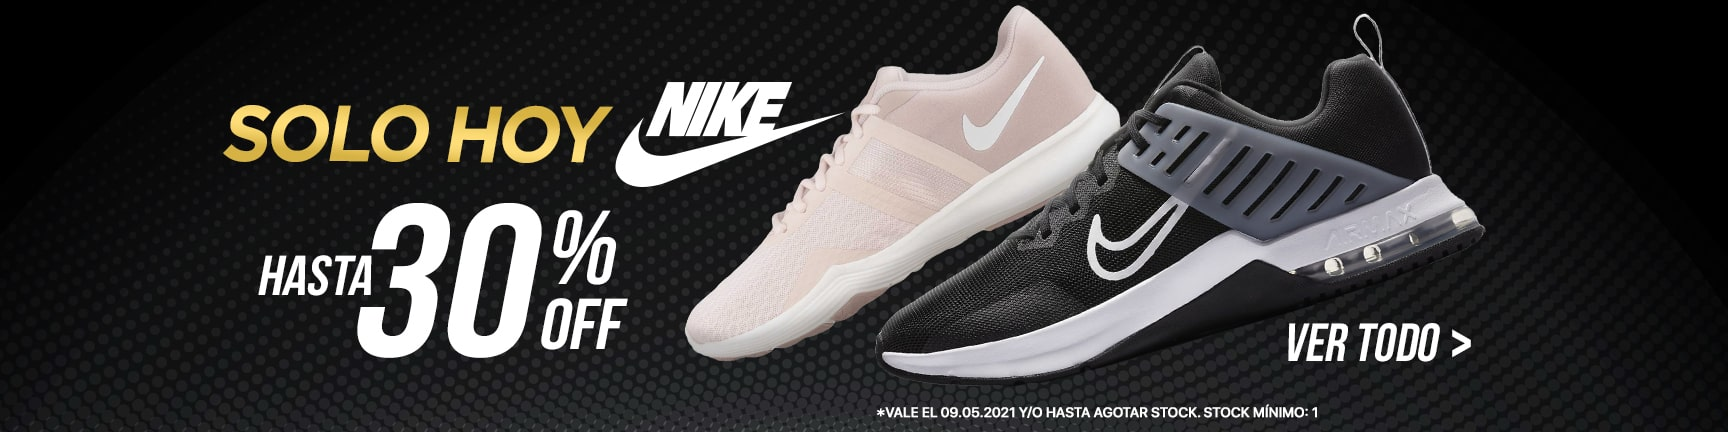 Oferta Flash Nike